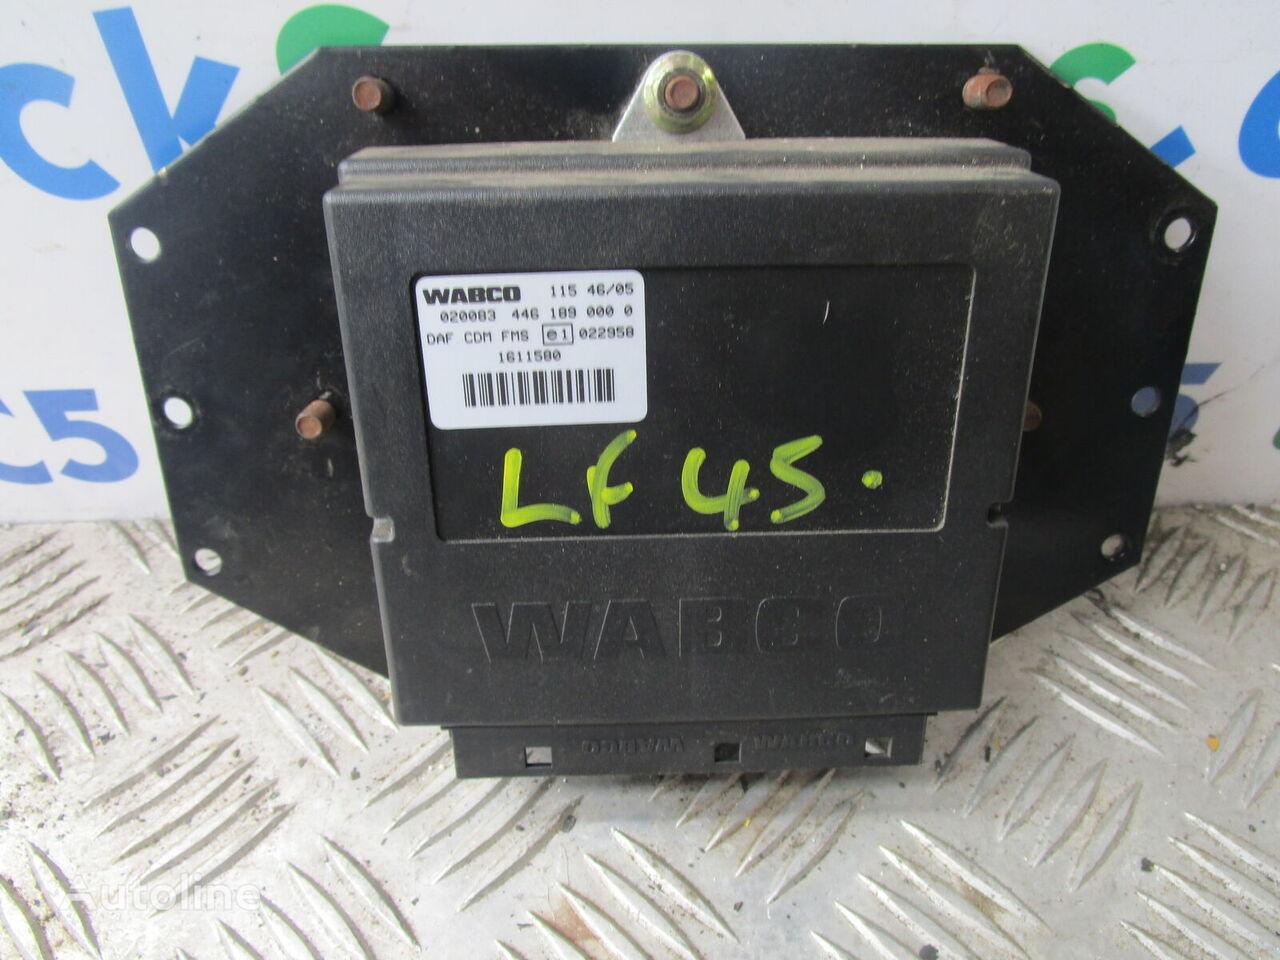 WABCO control unit for DAF LF 45  truck